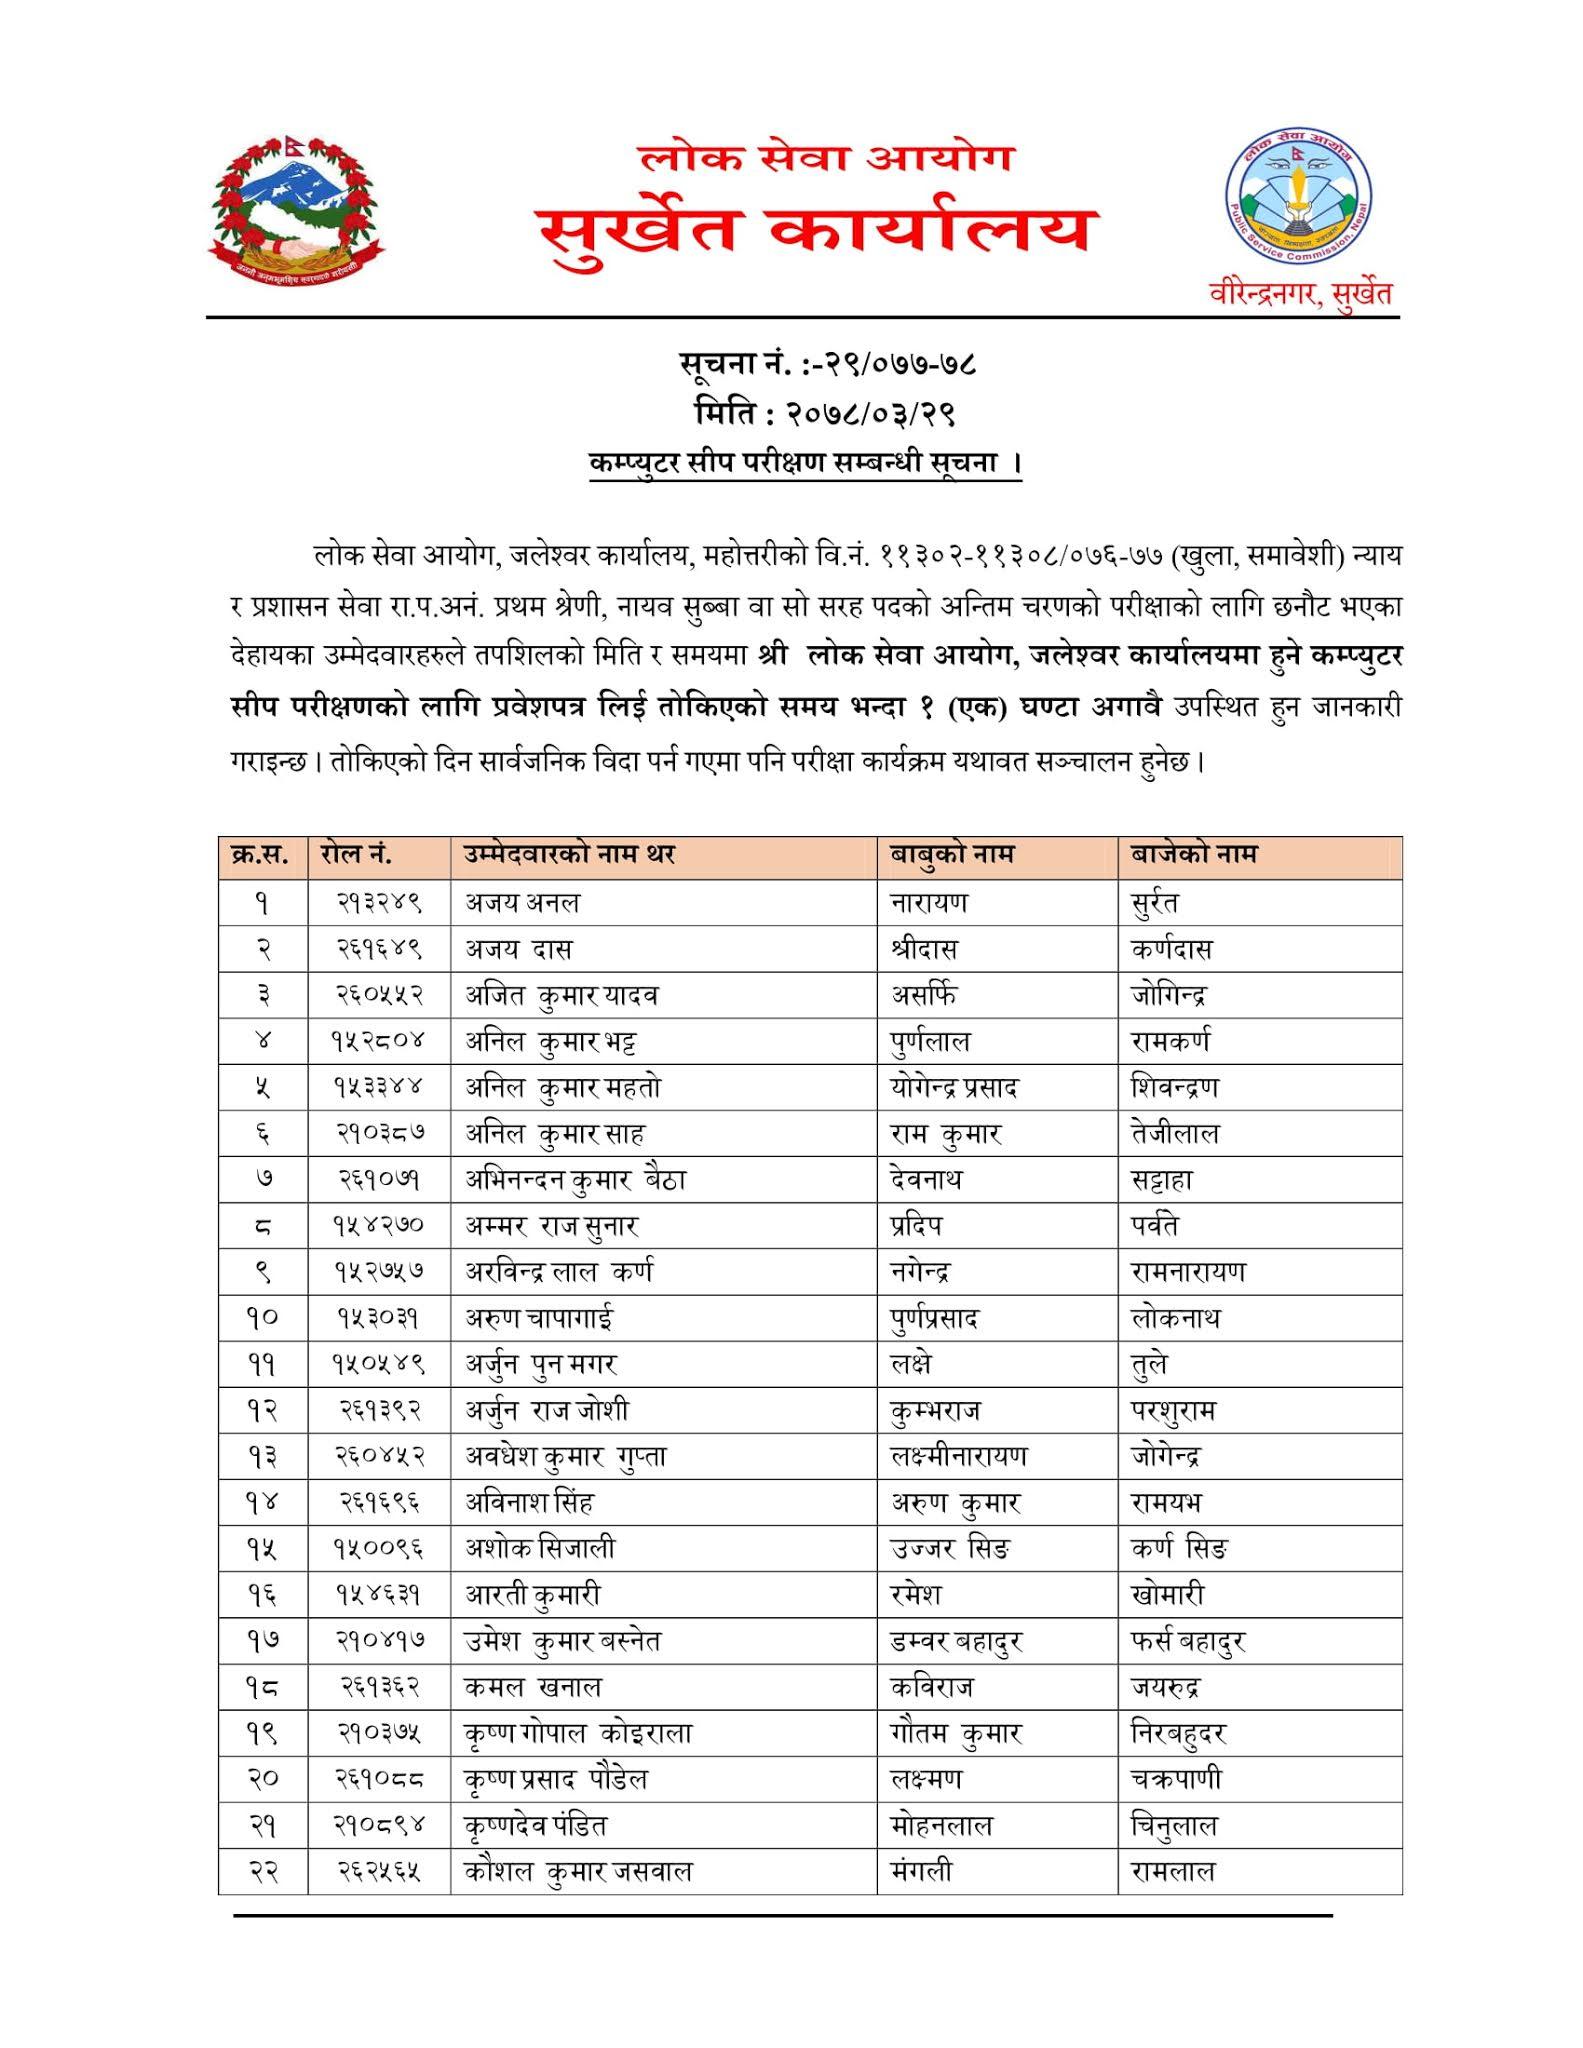 Jaleshwor Lok Sewa Aayog Written Exam Result & Exam Schedule of NASU published by Surkhet Lok Sewa Aayog